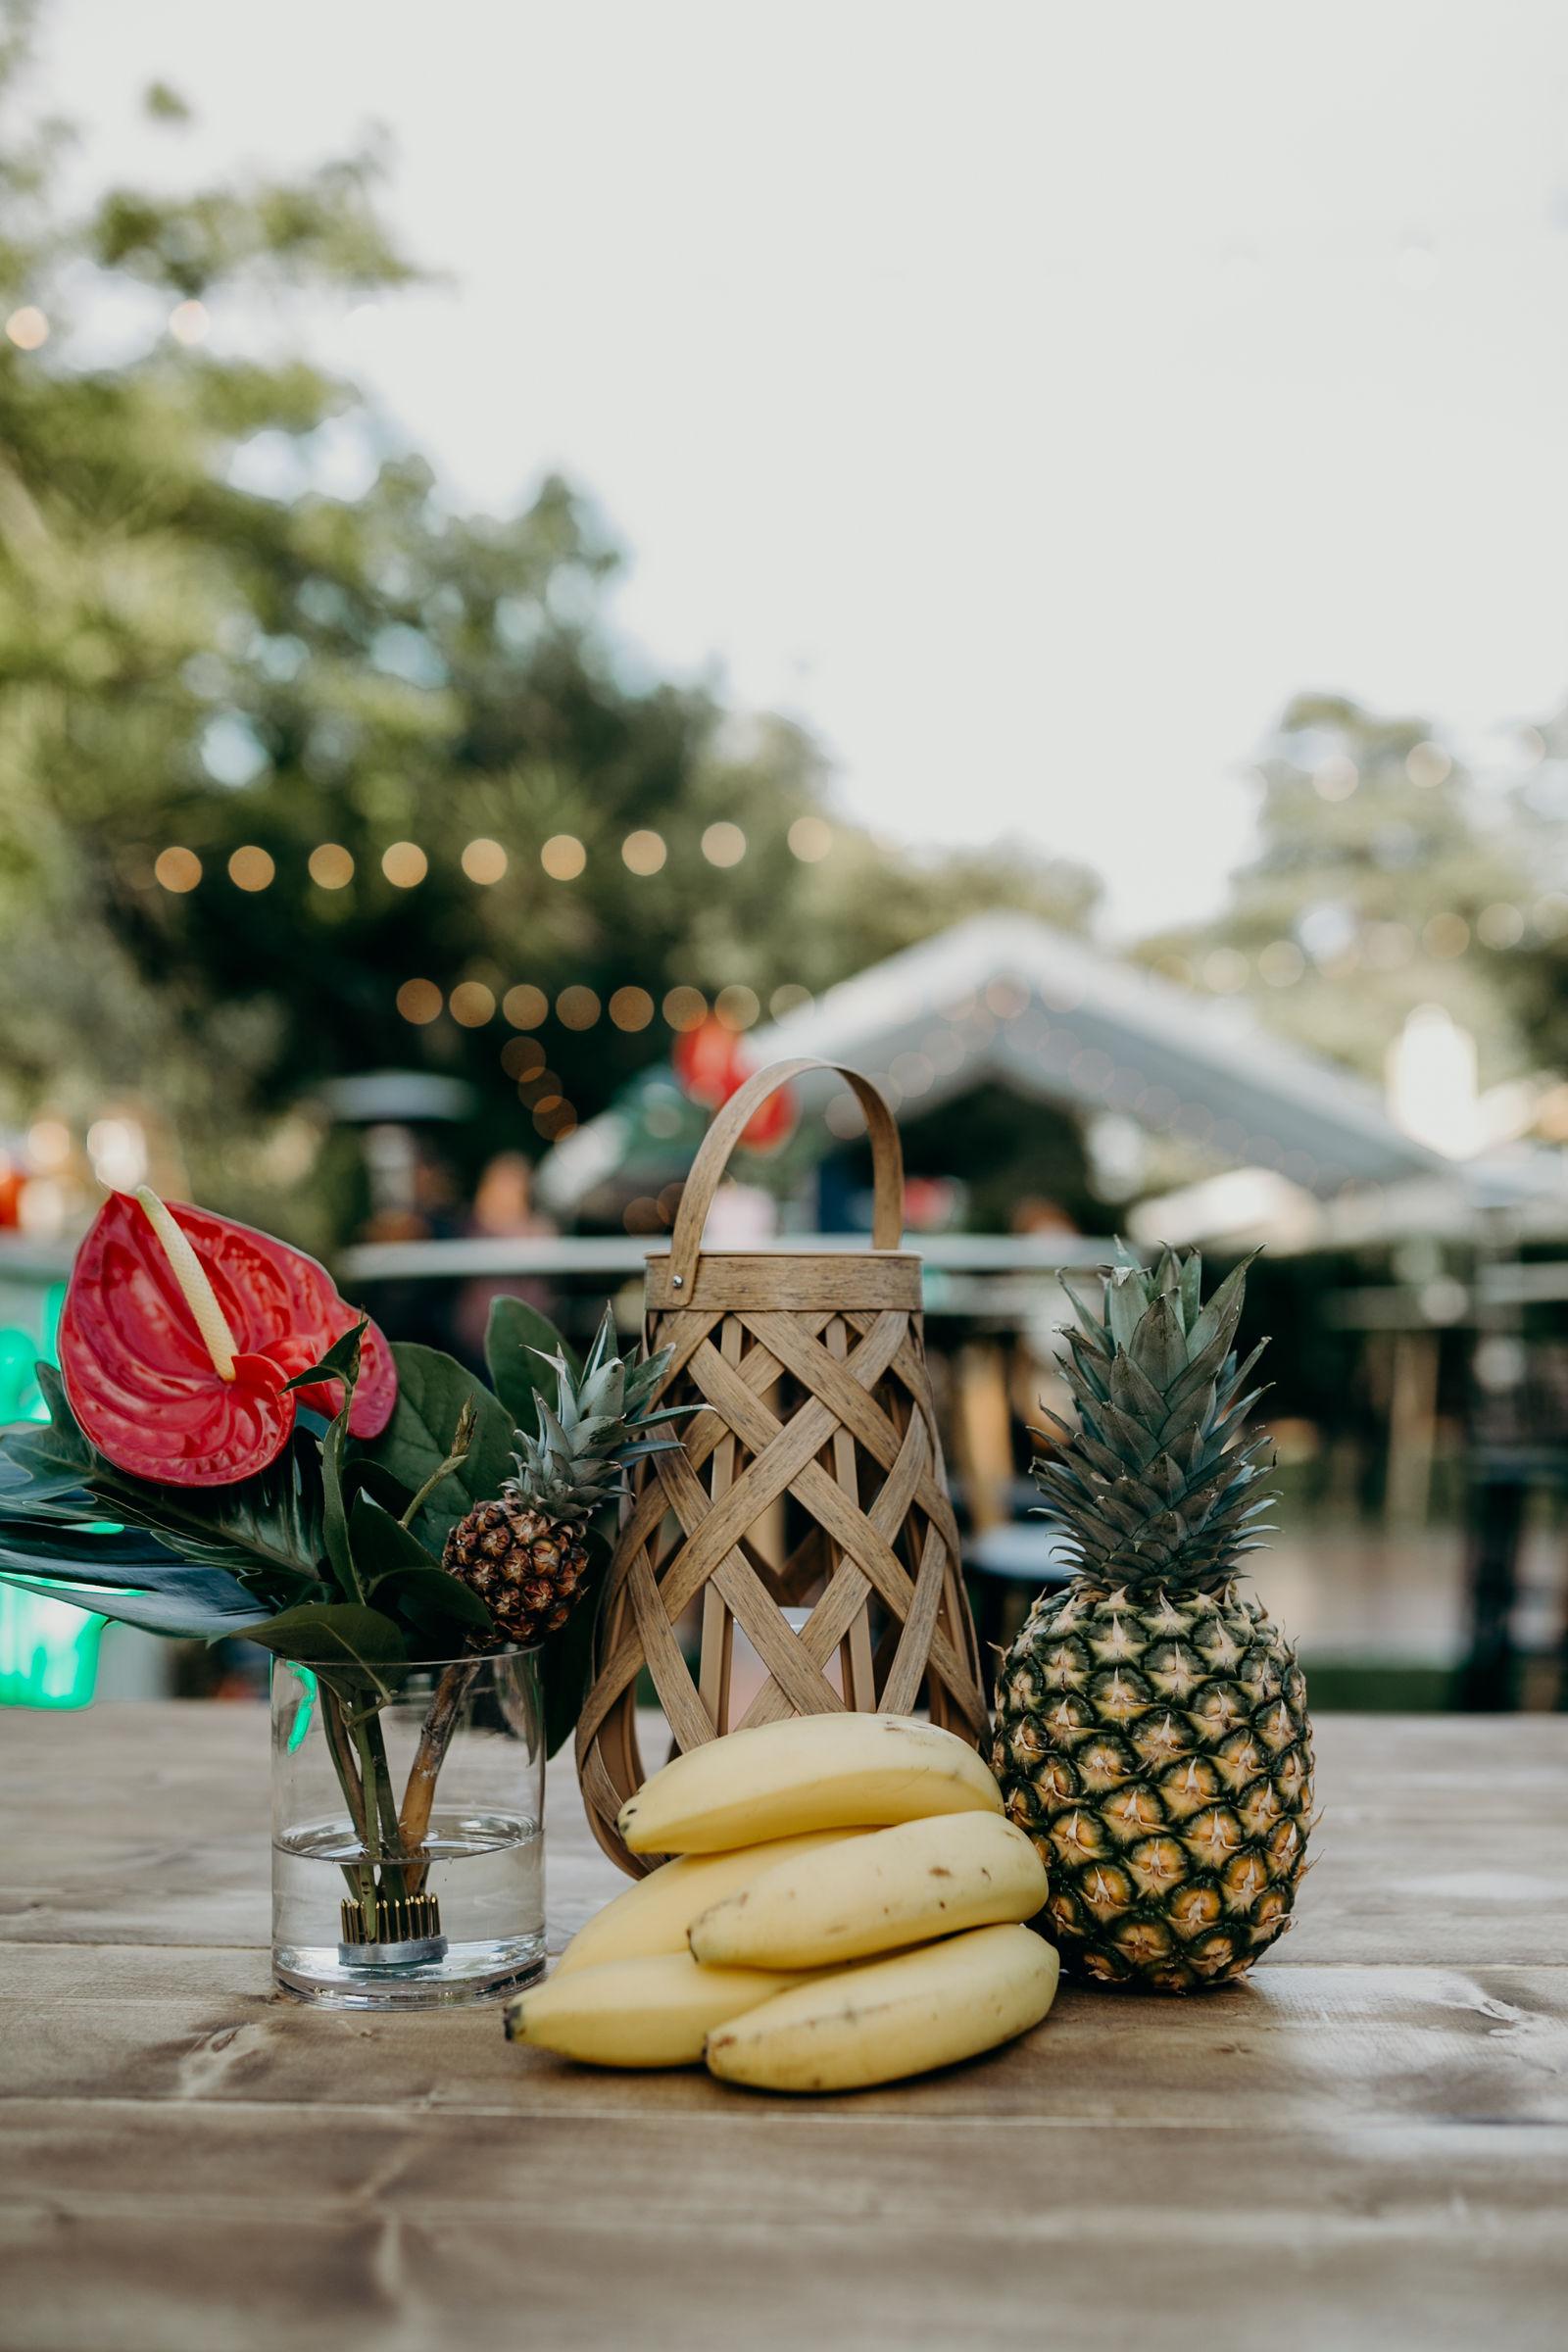 OC Wedding Photo Booth Rental